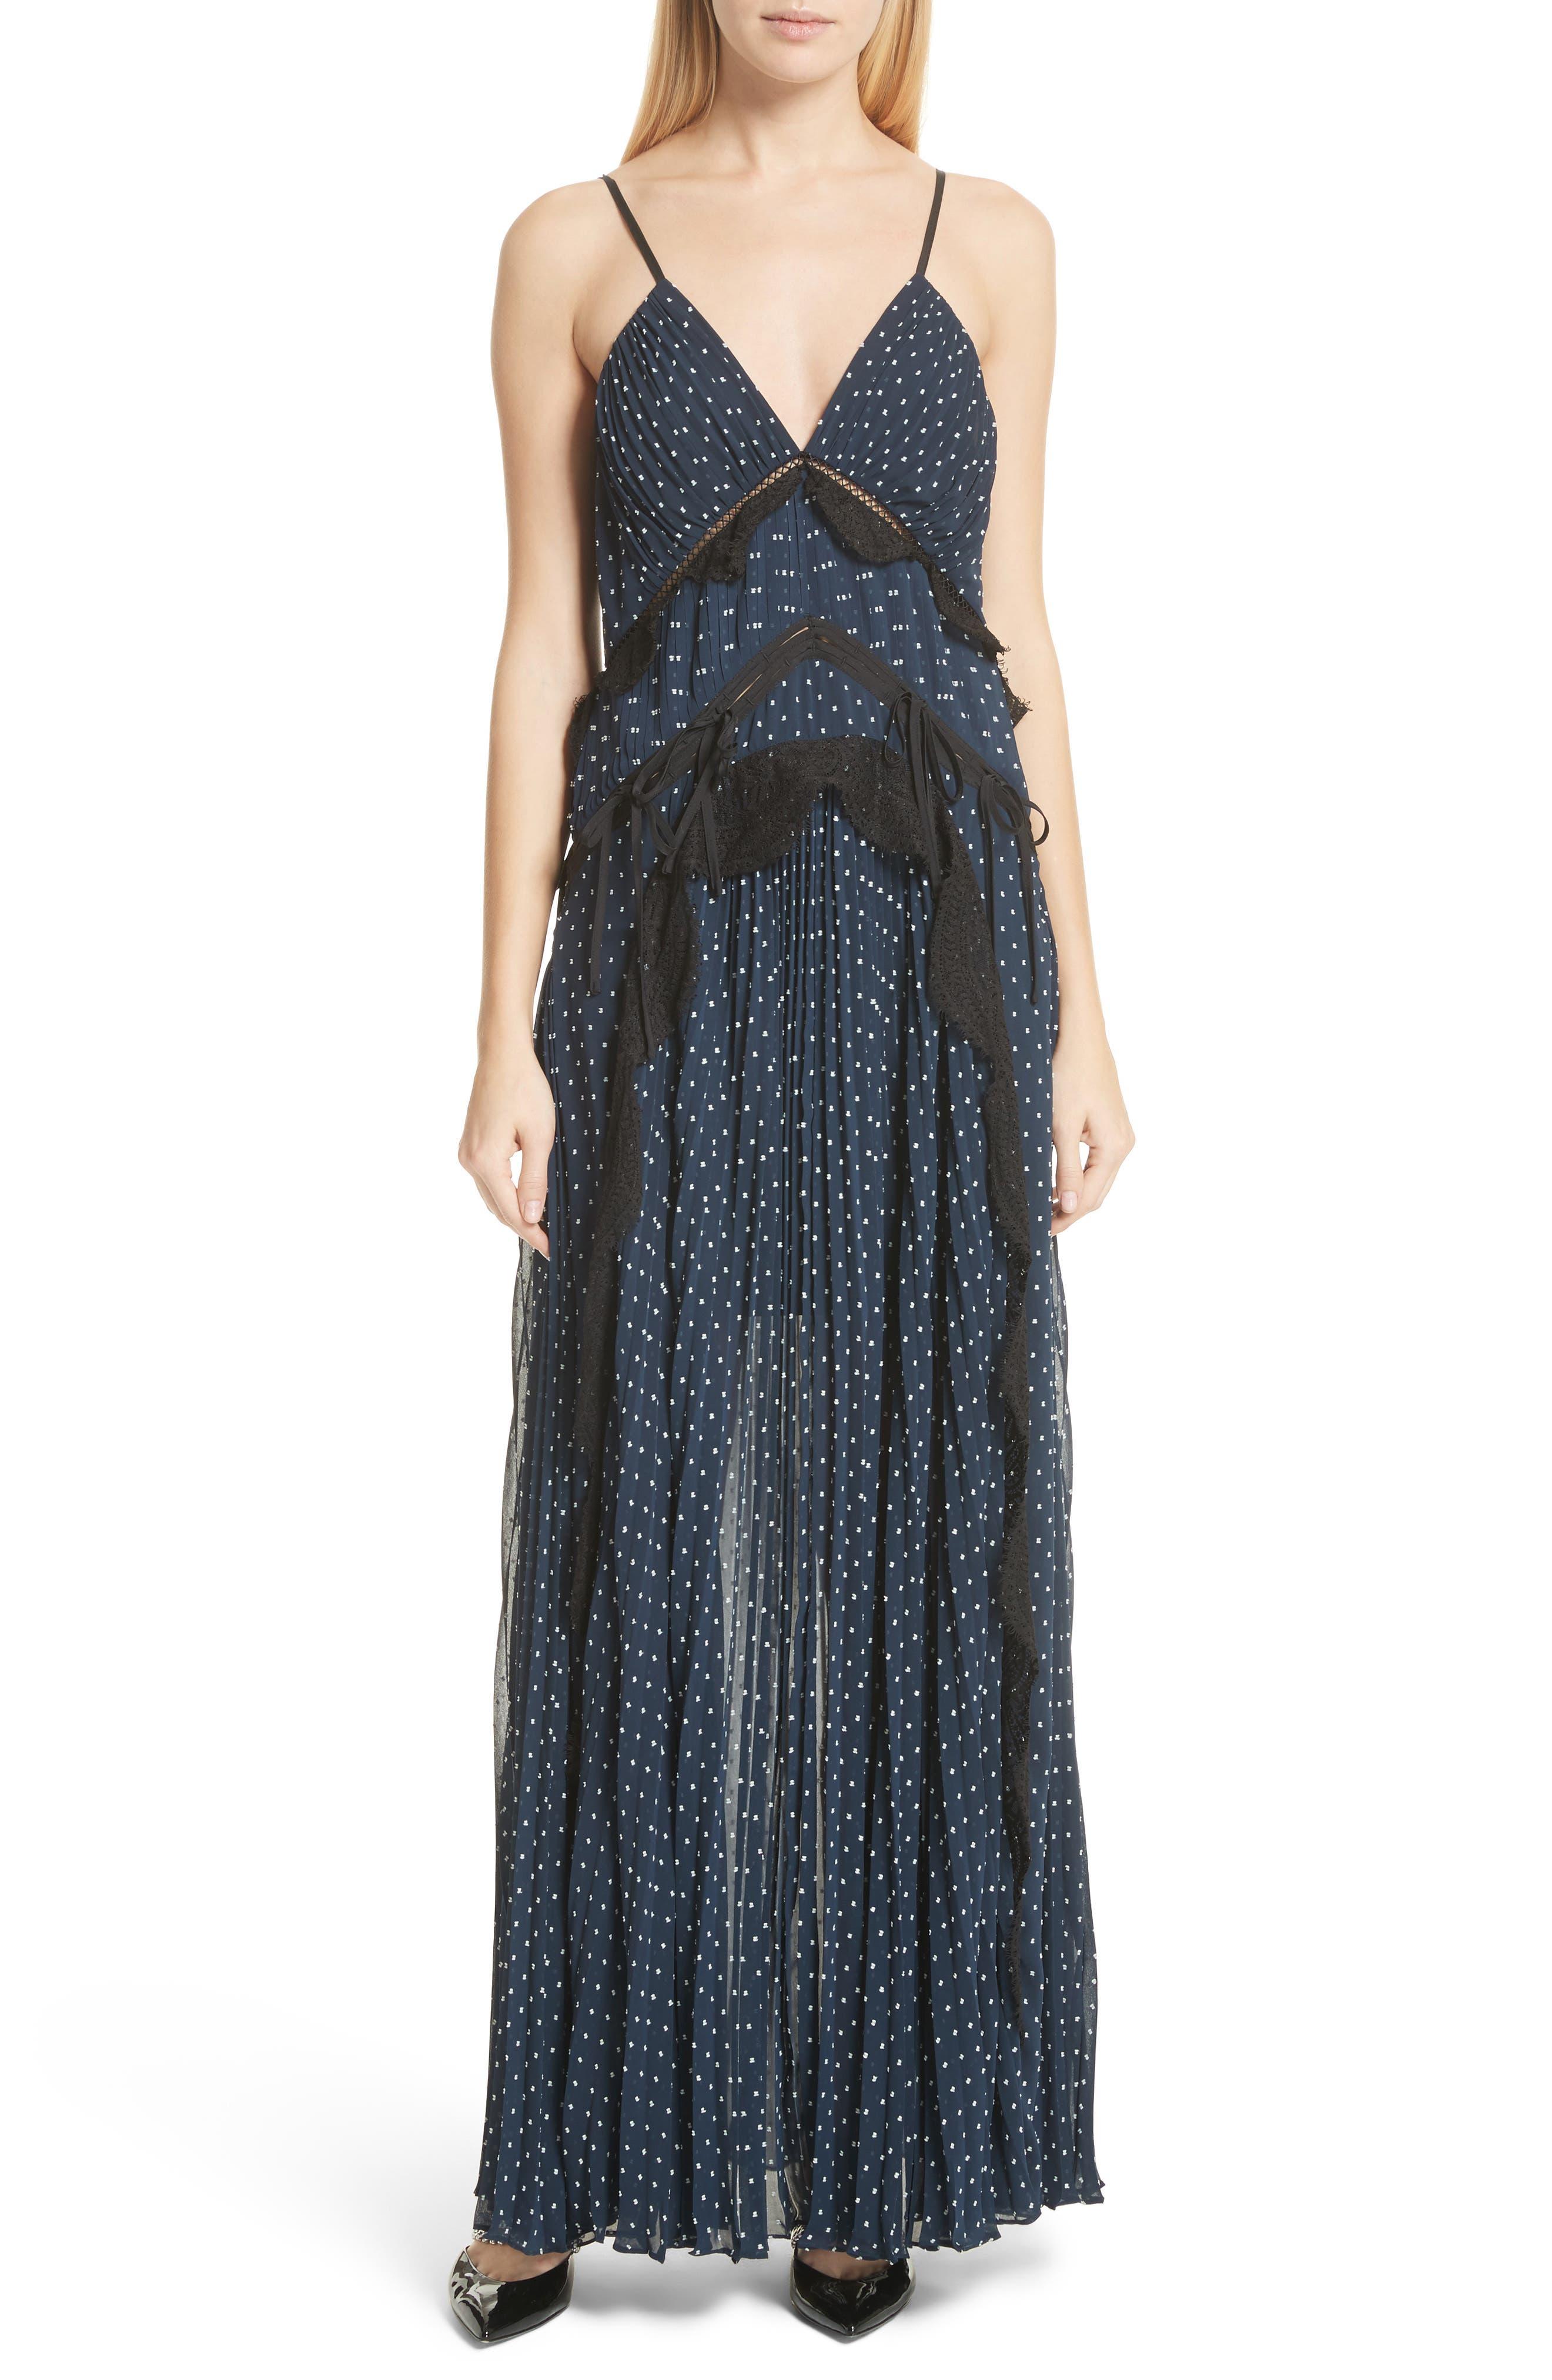 Plumetis Maxi Dress,                             Main thumbnail 1, color,                             Navy